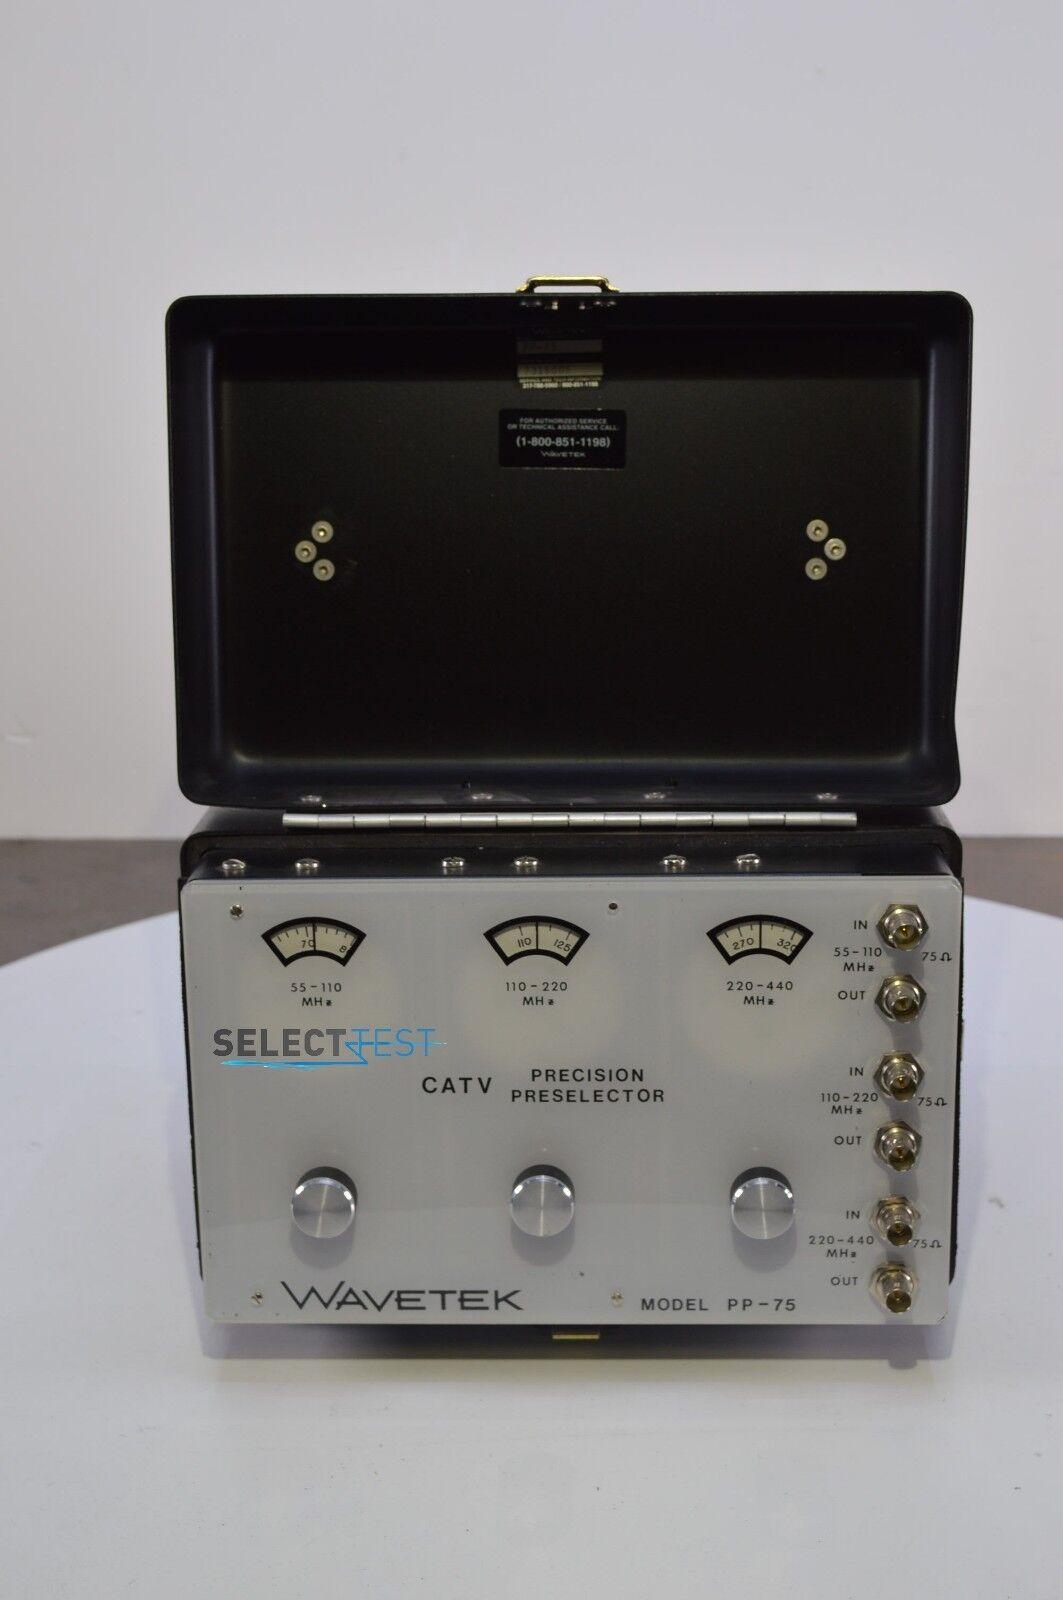 Wavetek Pp-75 CATV Precision Preselector Tunable Bandpass Filter